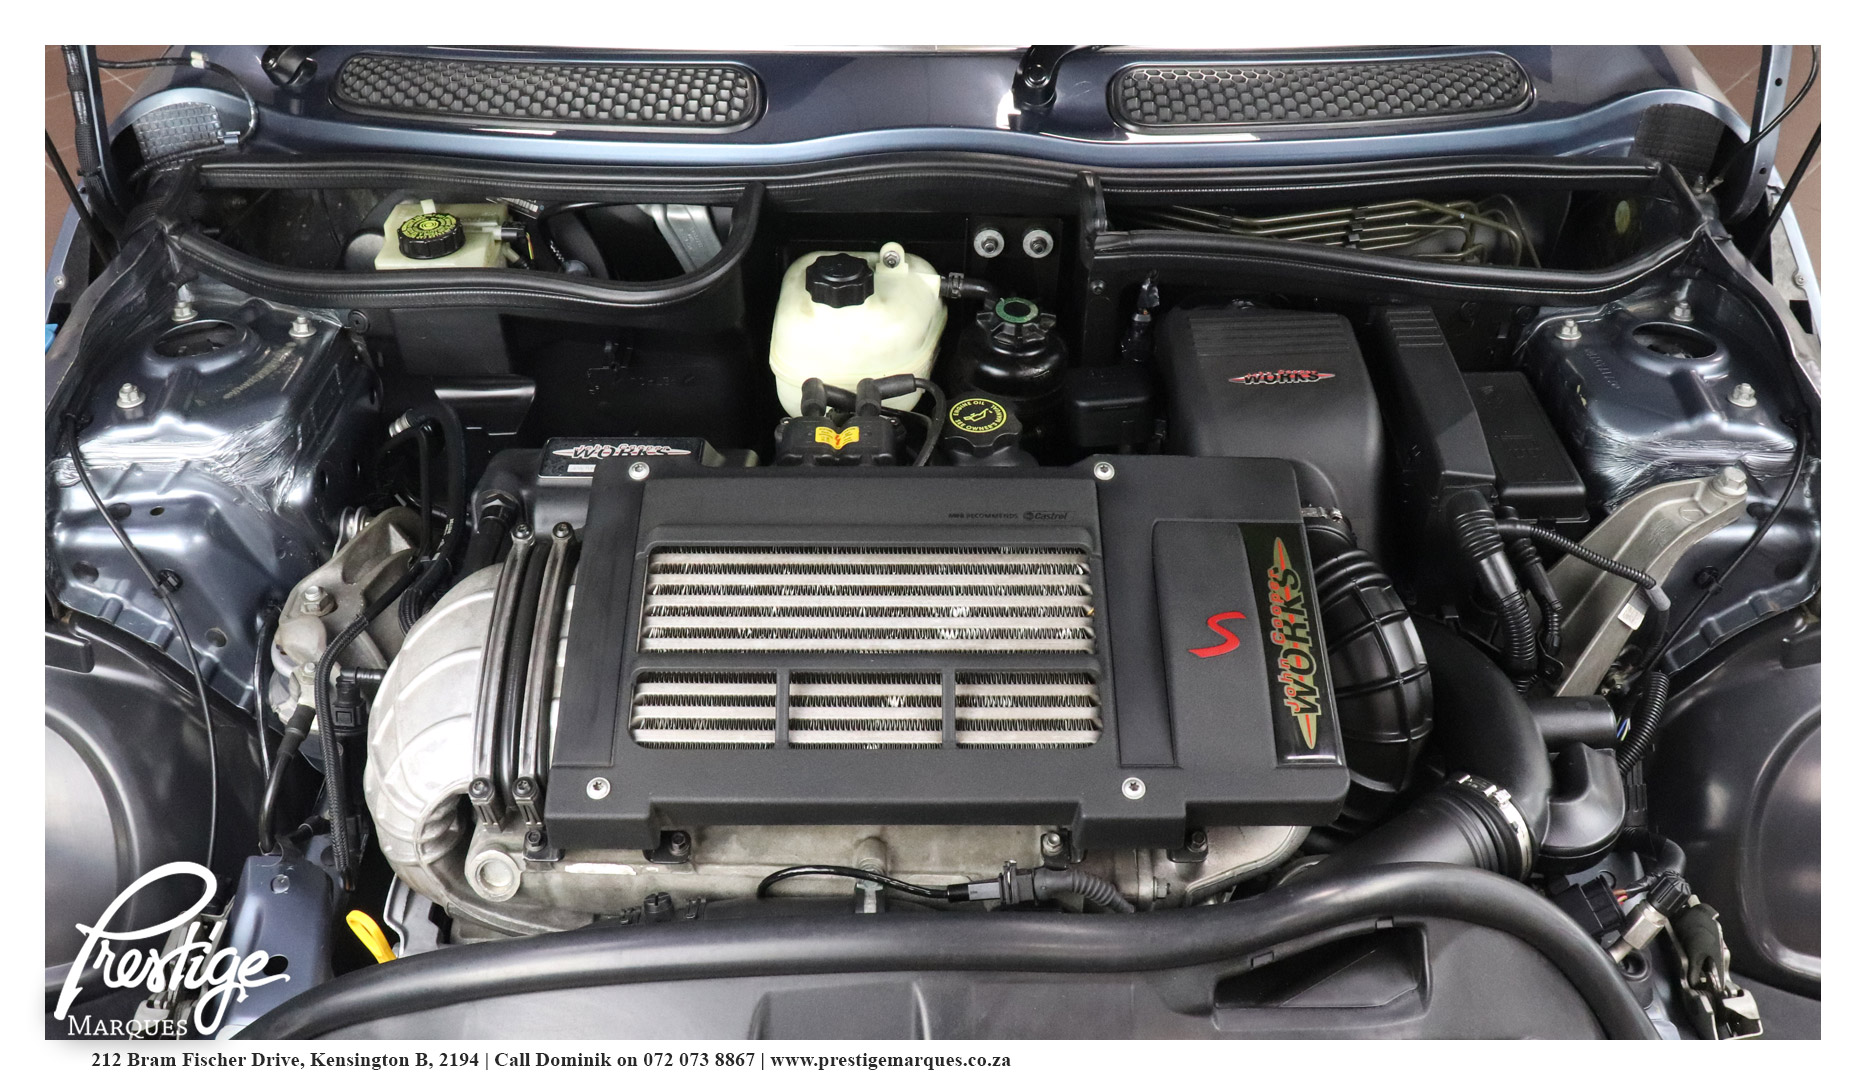 2006-Mini-Cooper-S-GP-Johon-Cooper-Works- Prestige-Marques-Randburg-Sandton-12